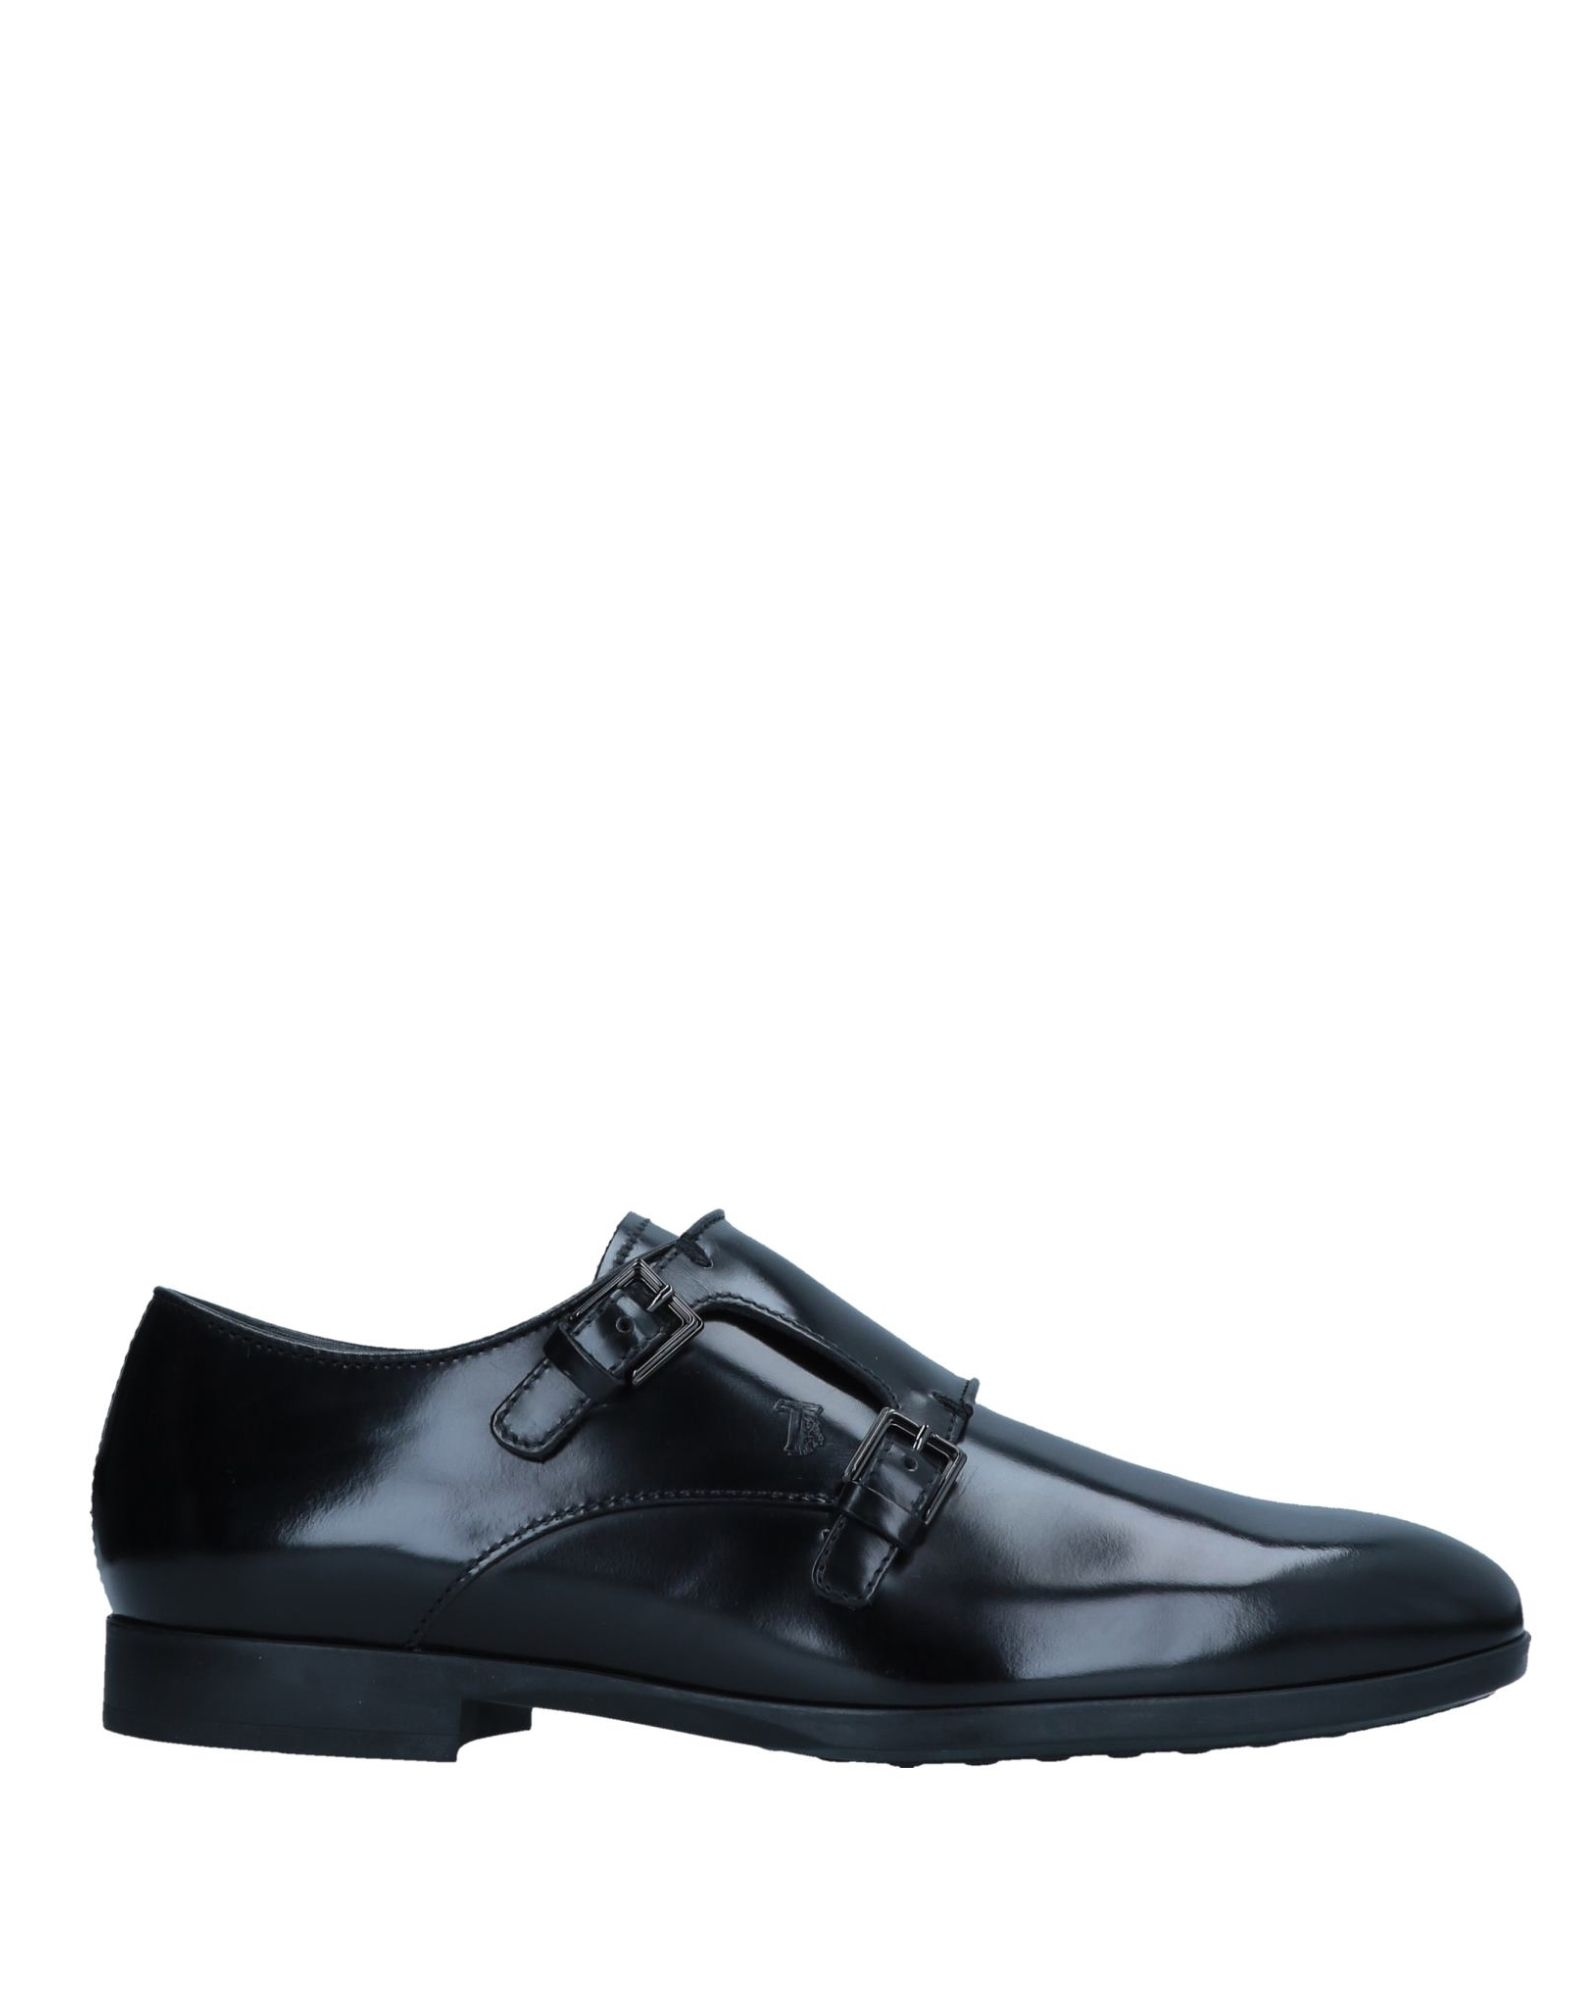 Tod's Mokassins Herren  11550611XS Gute Qualität beliebte Schuhe